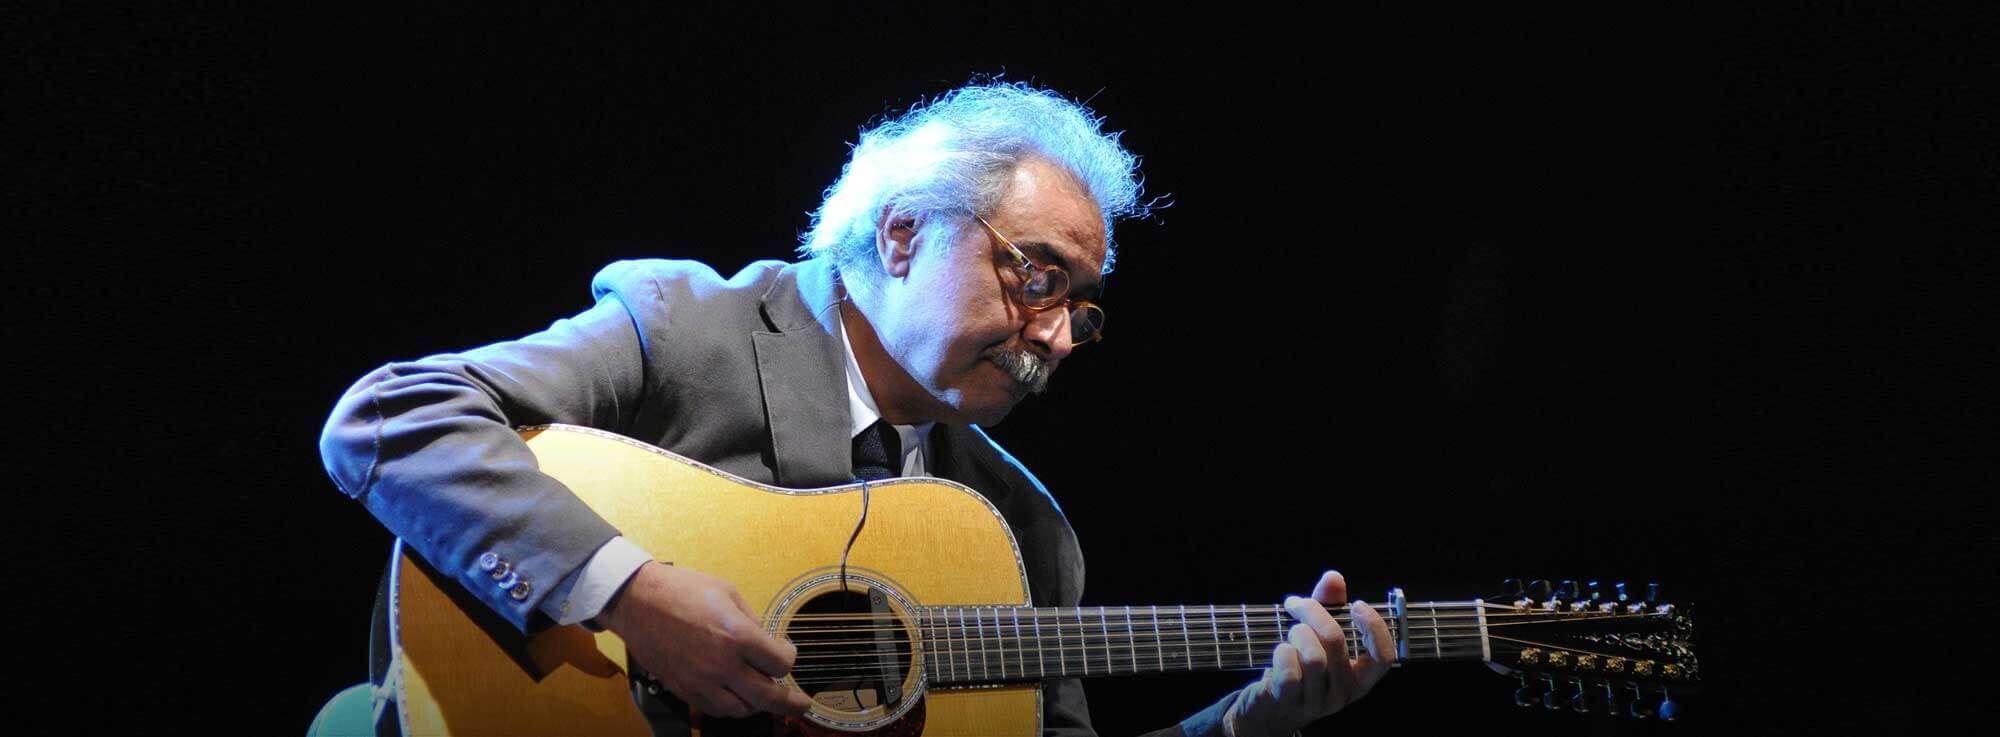 Corigliano d'Otranto: Marco Poeta suona Sergio Endrigo